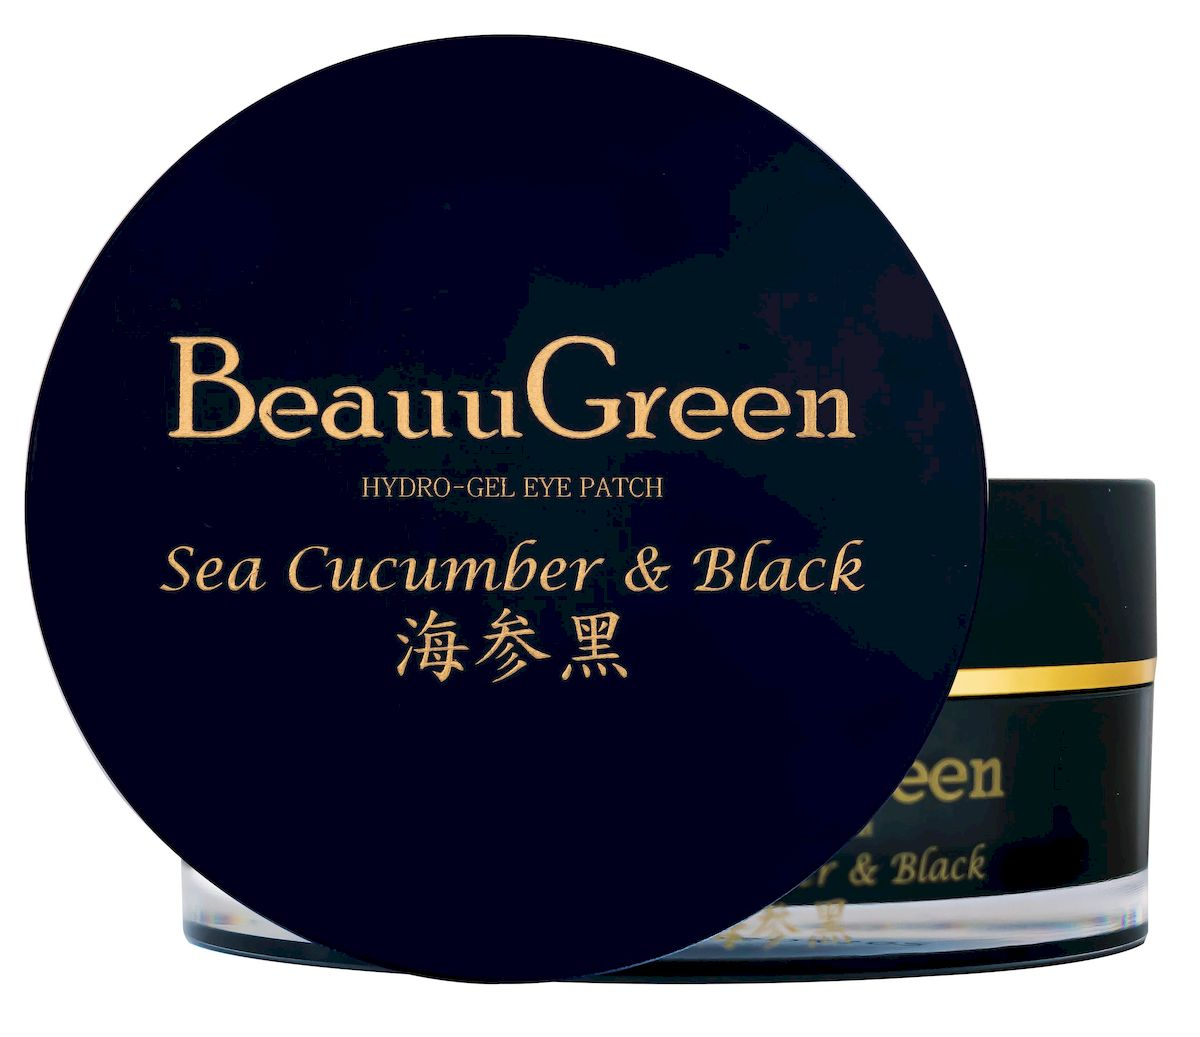 BeauuGreen Гидрогелевые патчи для кожи вокруг глаз Sea Cucumber & Black Hydrogel Eye Patch, 90 г гидрогелевые патчи для глаз ottie gold prestige resilience hydrogel eye zone mask